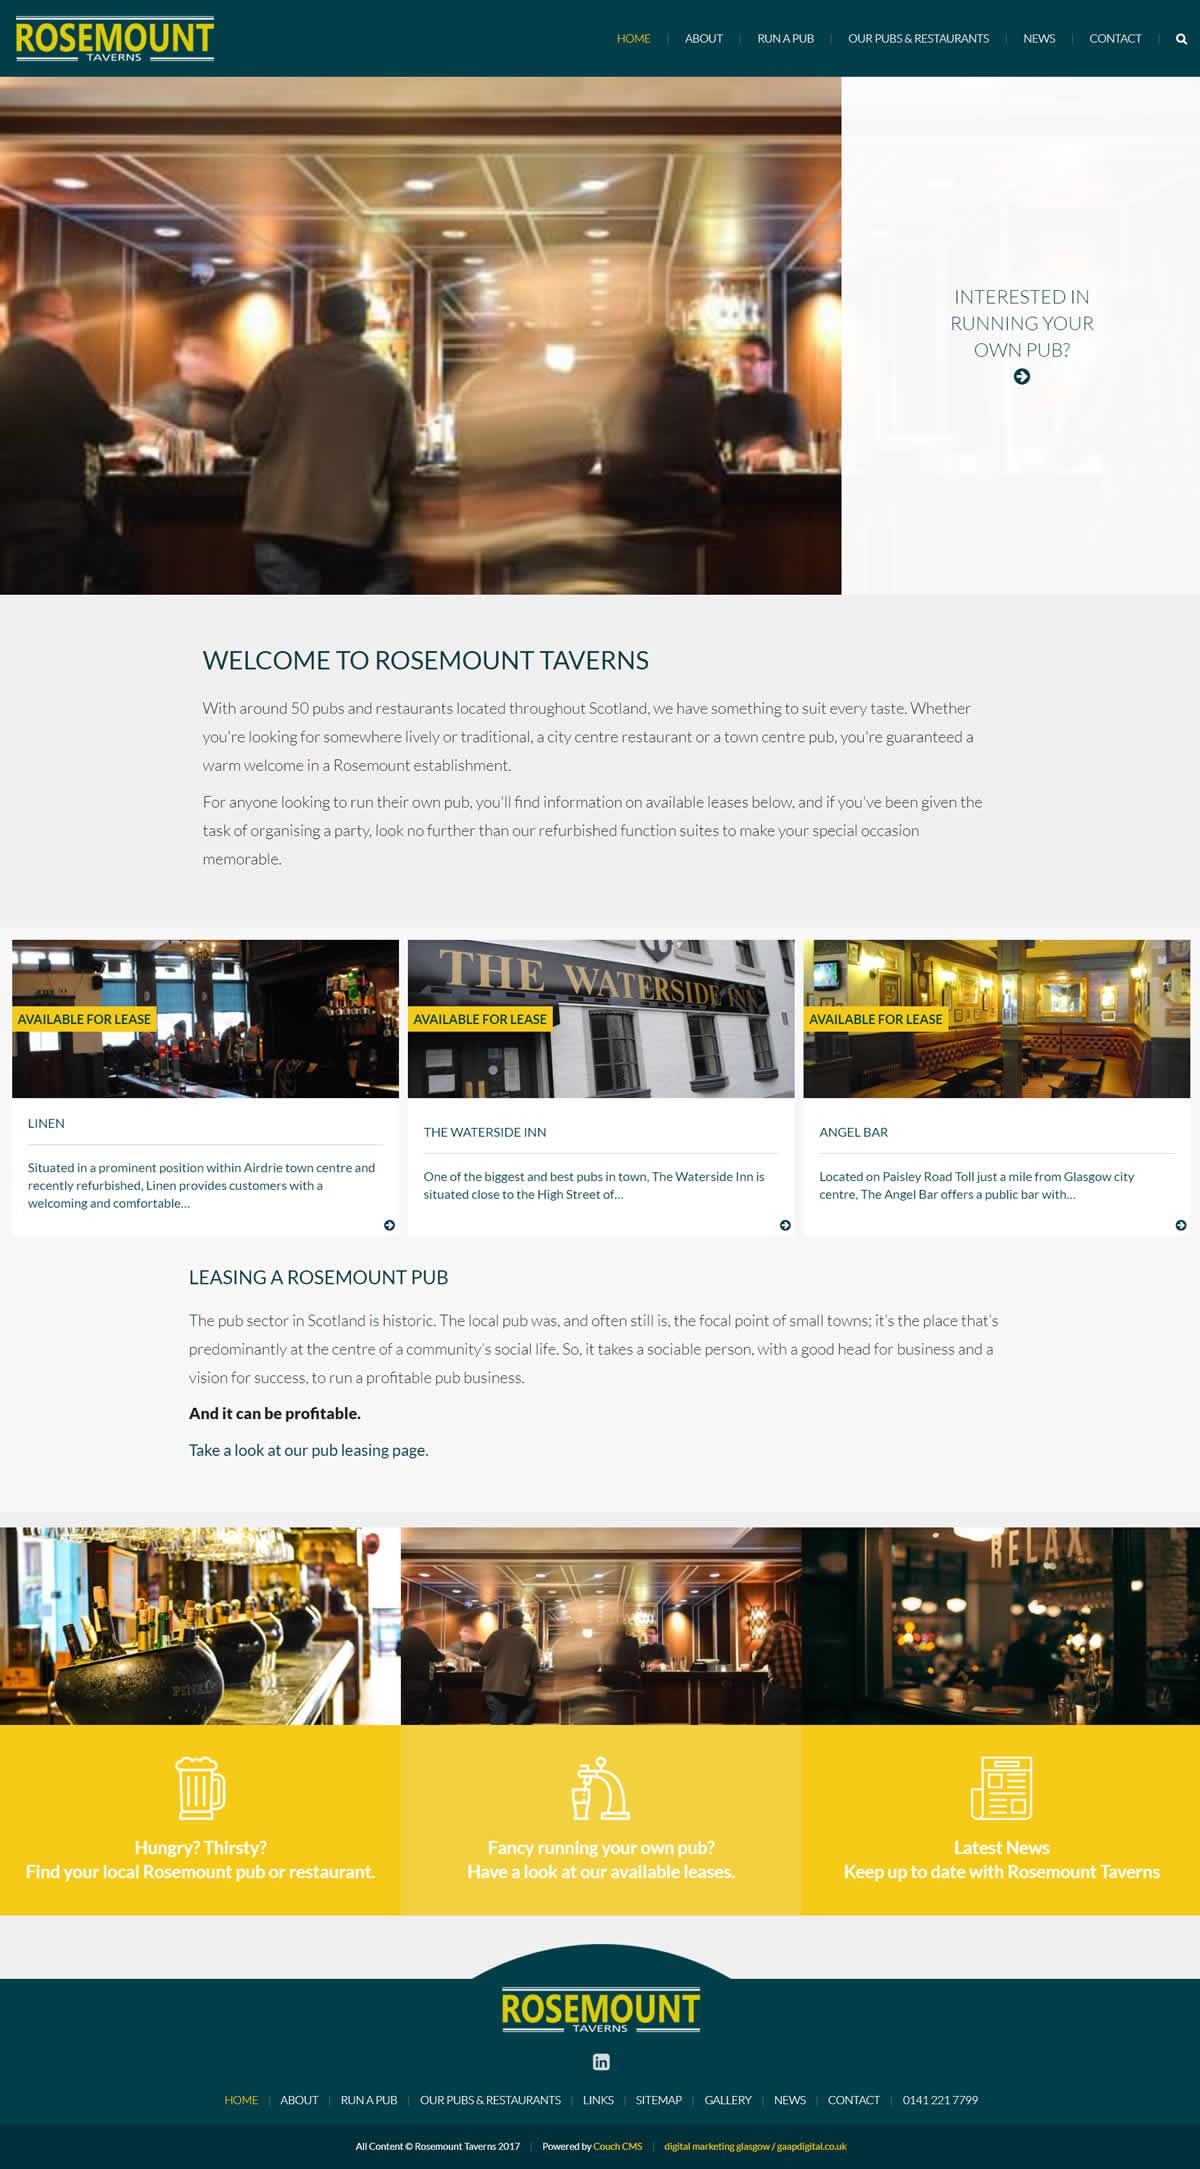 Rosemount Taverns